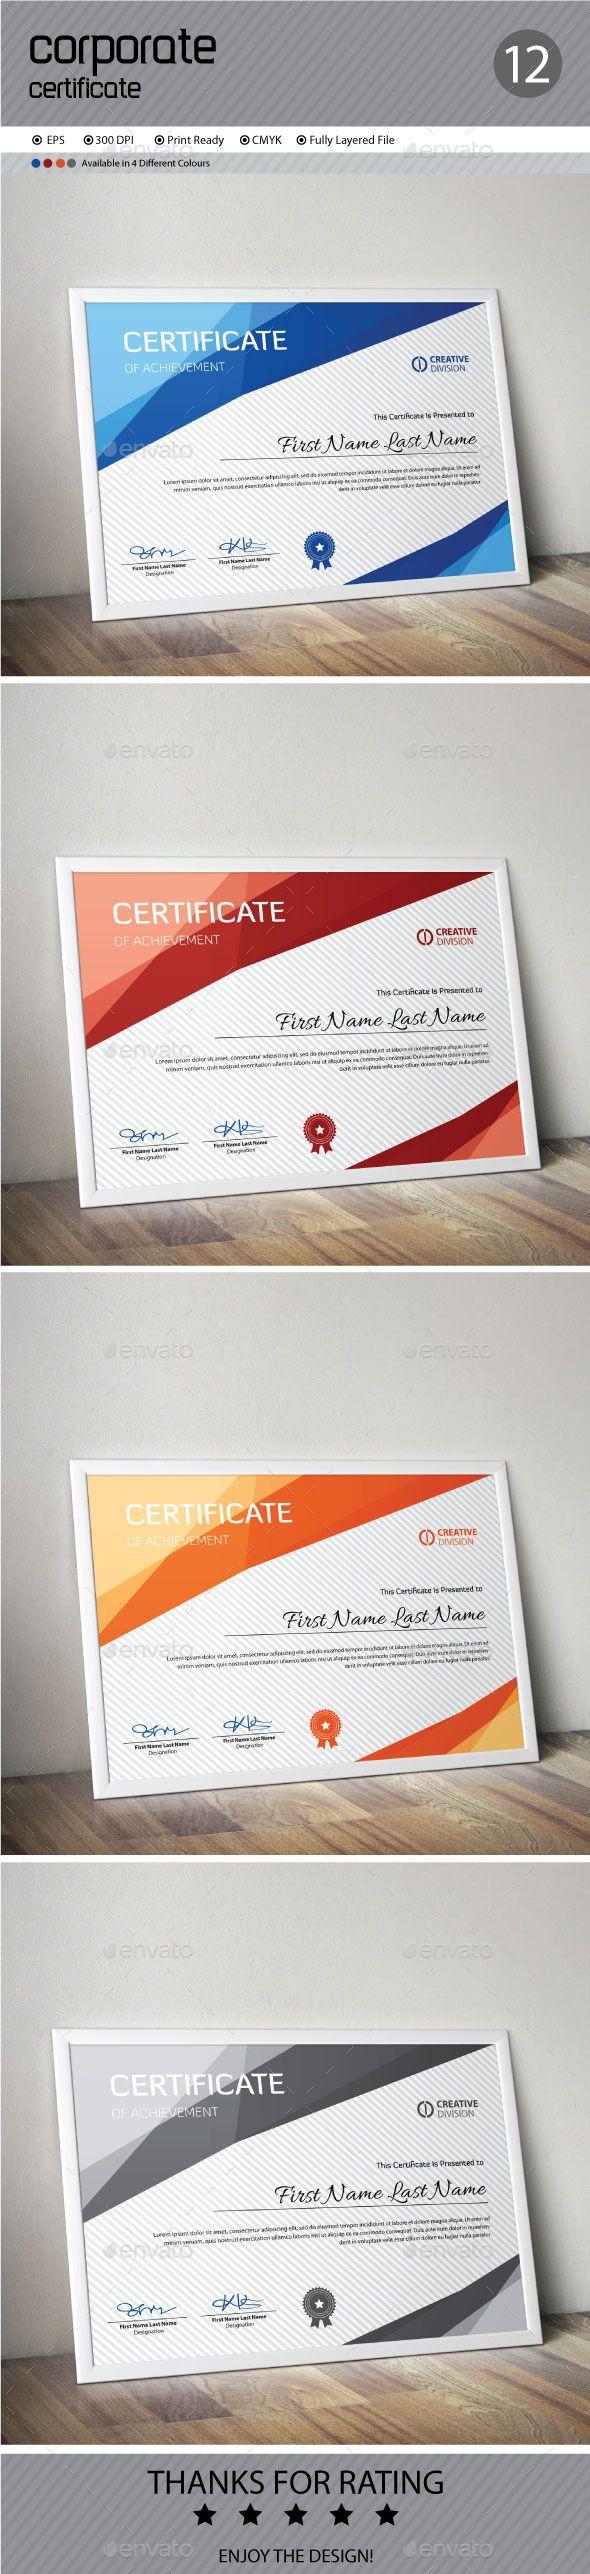 Certificate Template Vector EPS. Download here: http://graphicriver.net/item/certificate/12367206?ref=ksioks